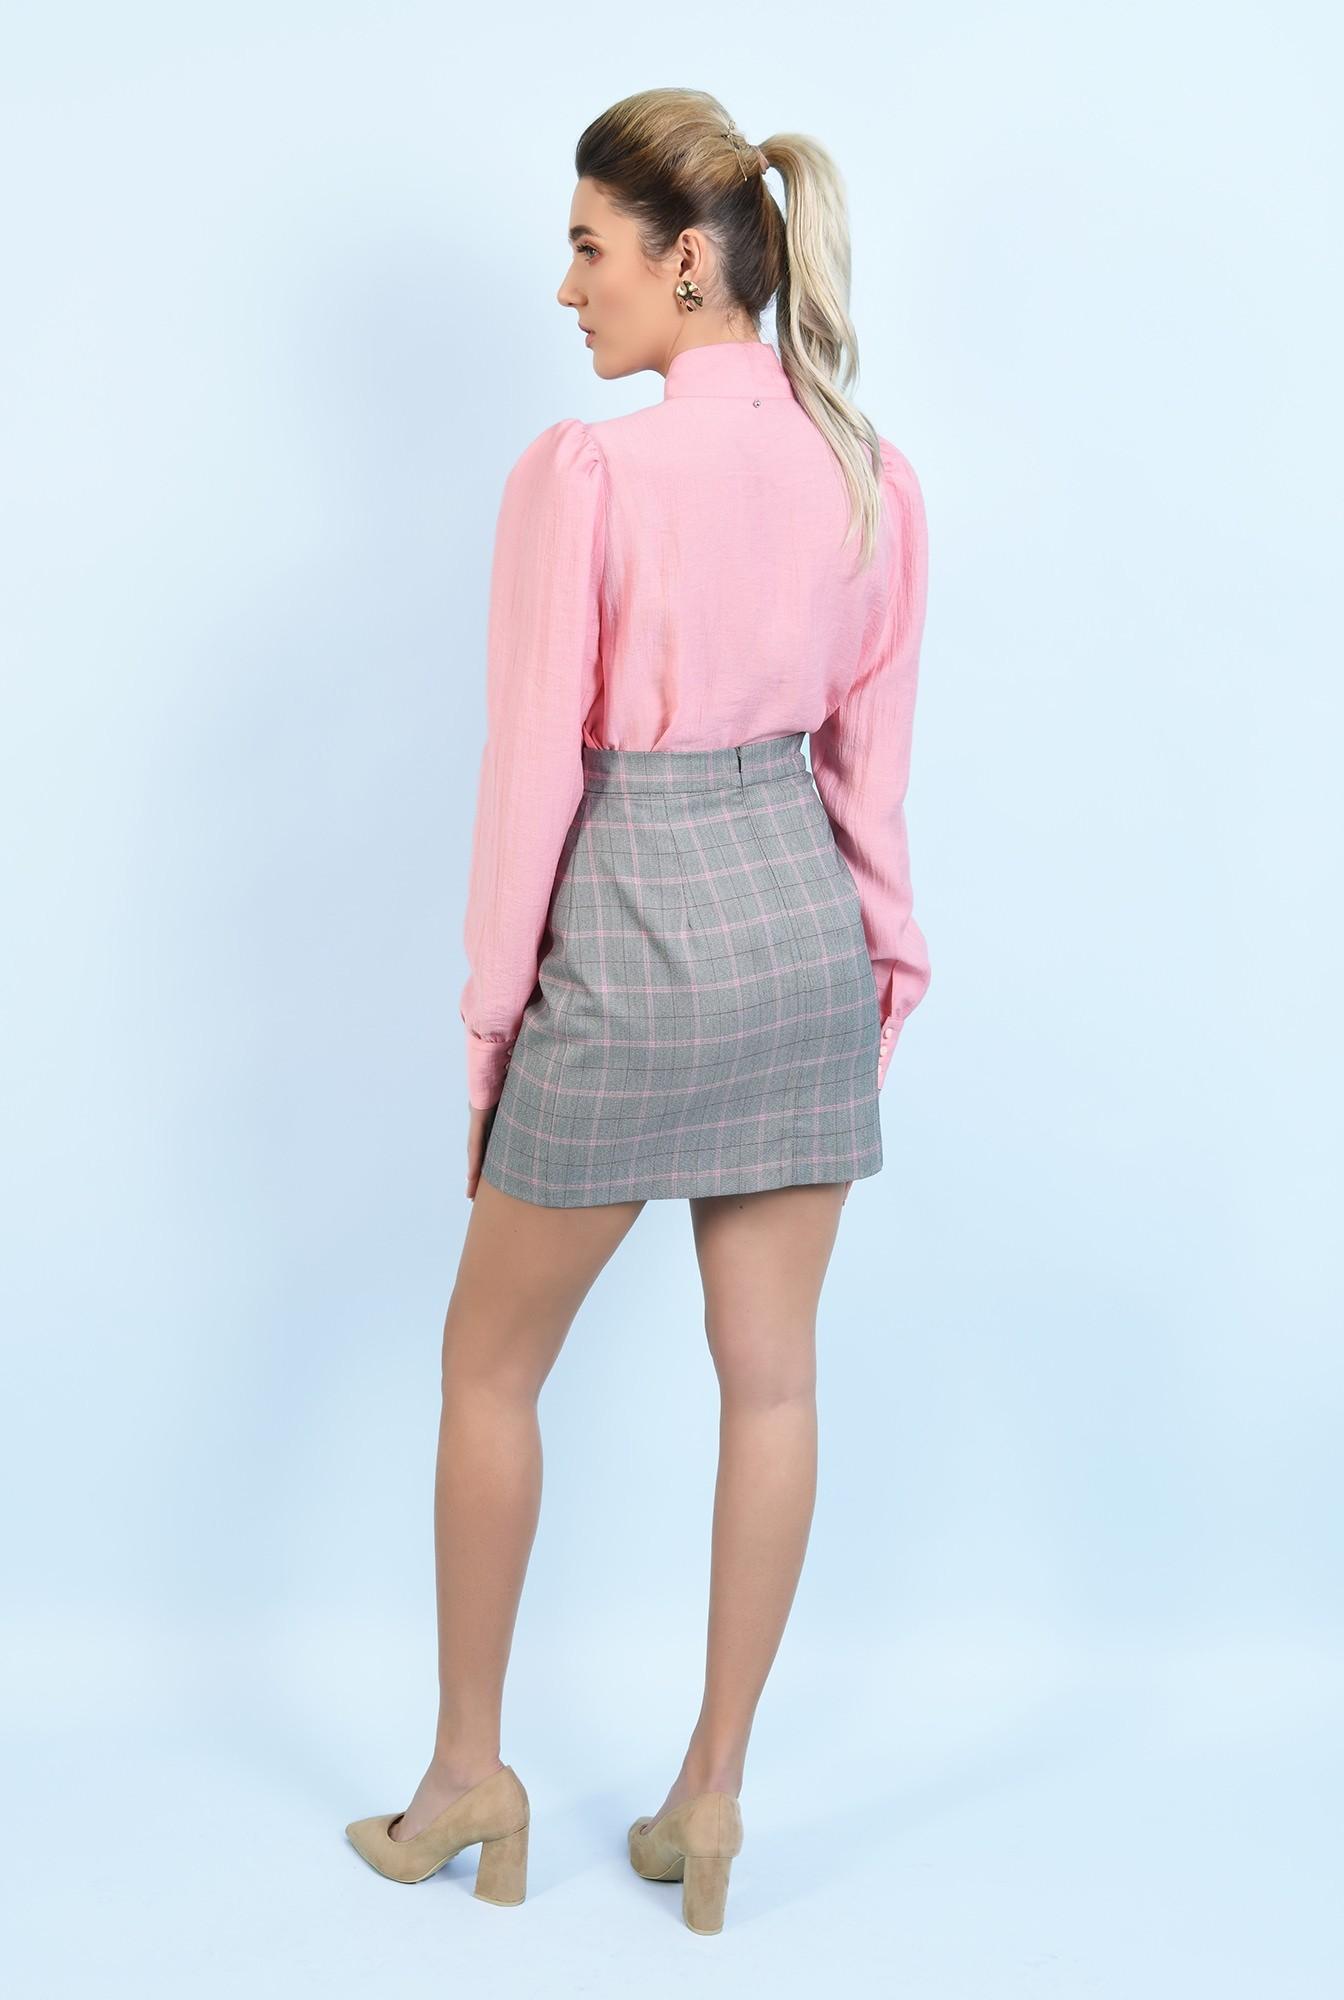 1 - bluza casual, roz, cu funda, maneci lungi, Poema